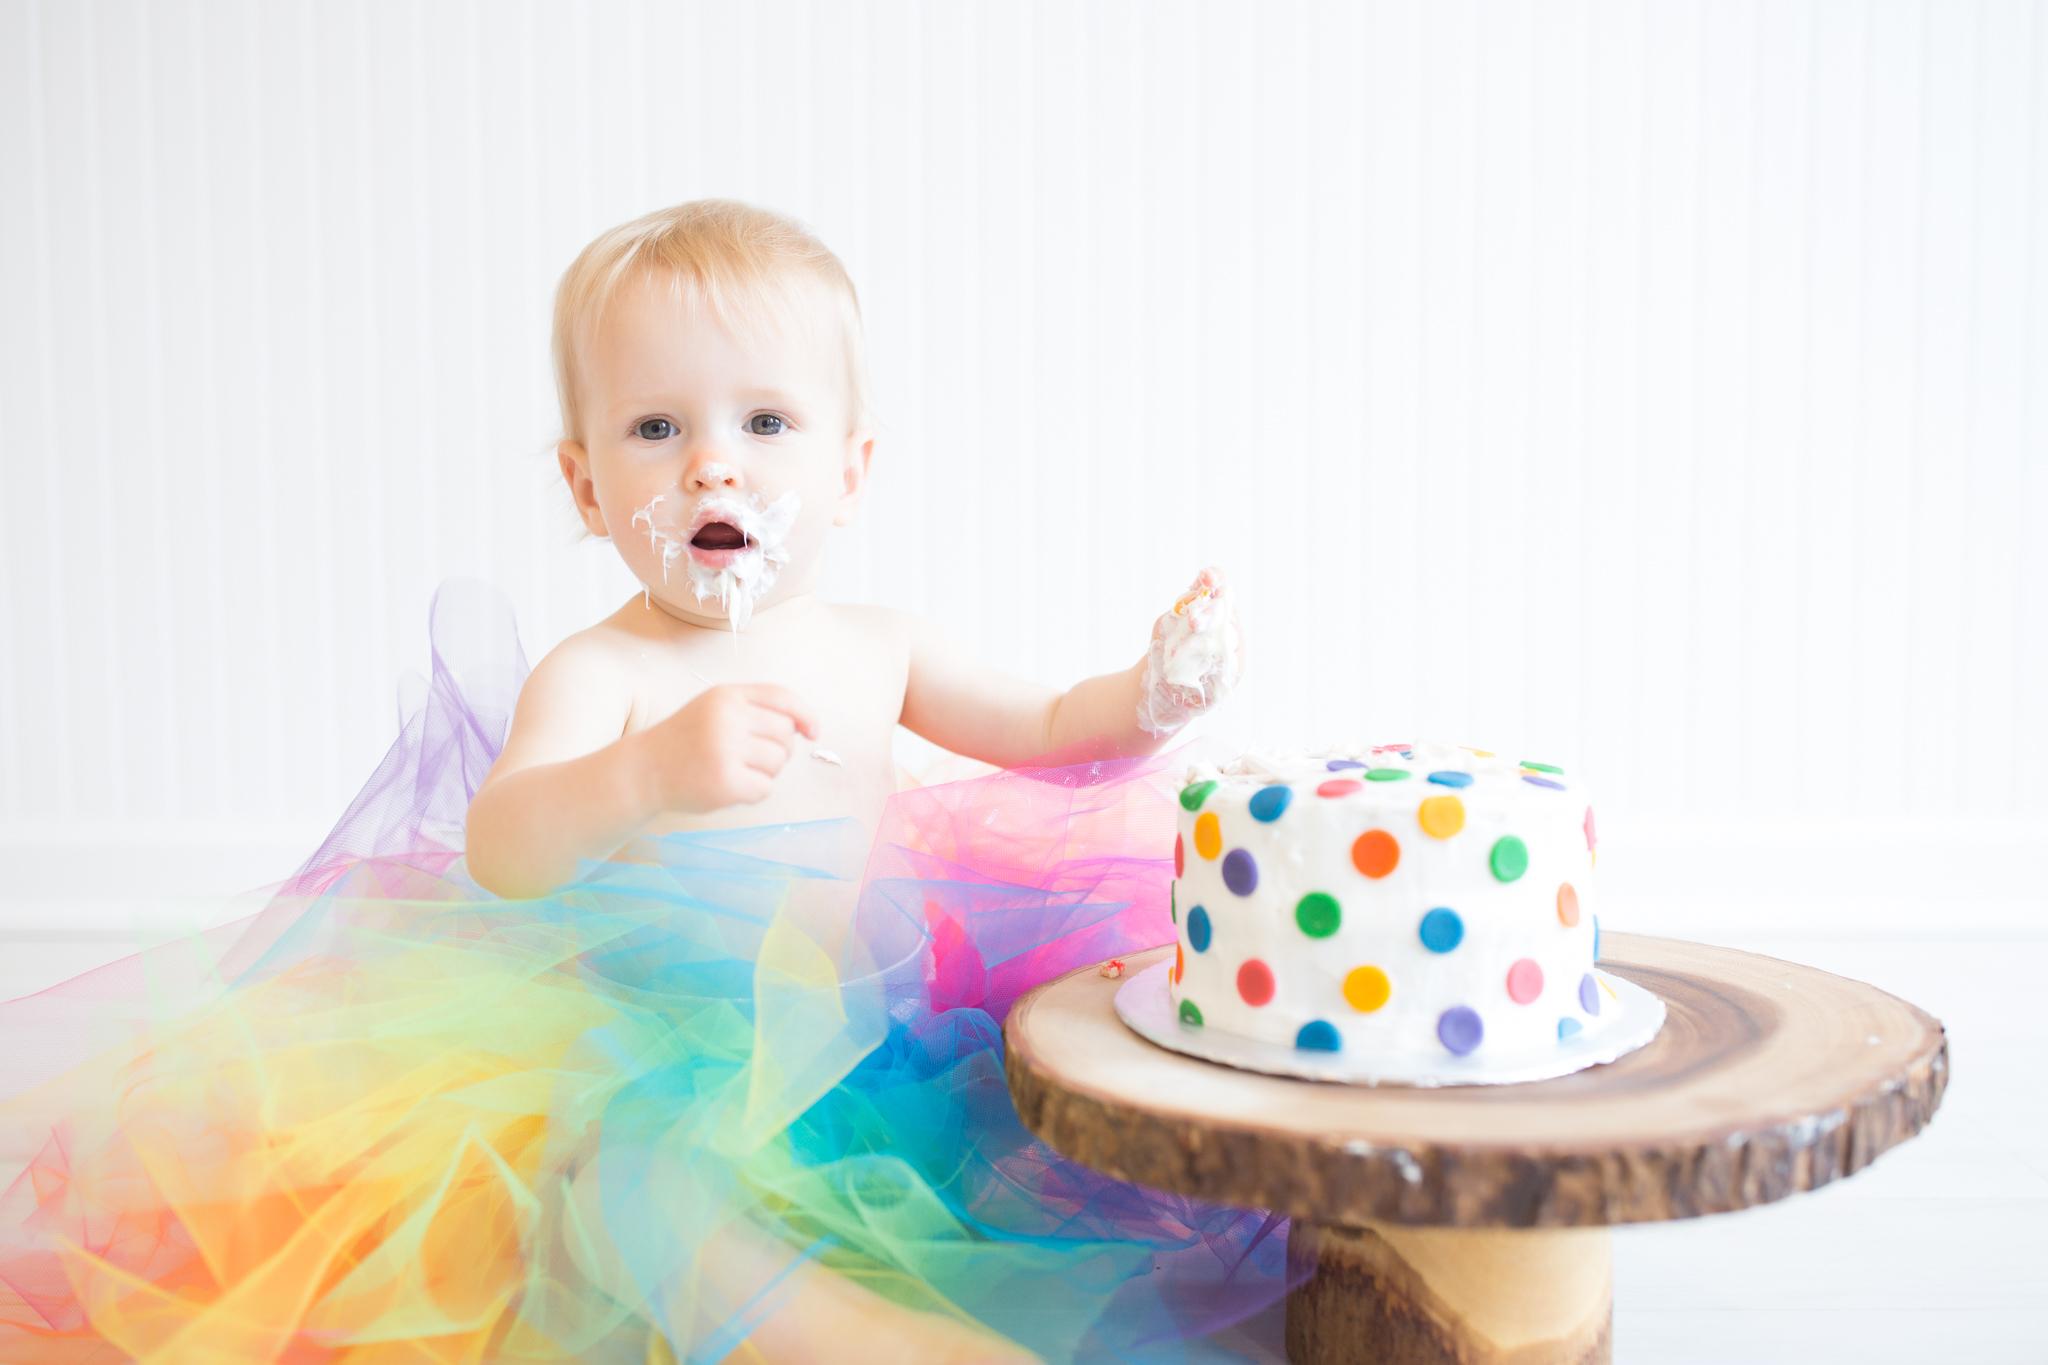 Milestone cake smash Newborn Studio Session | Cara Peterson Photography Rockford IL-14.jpg